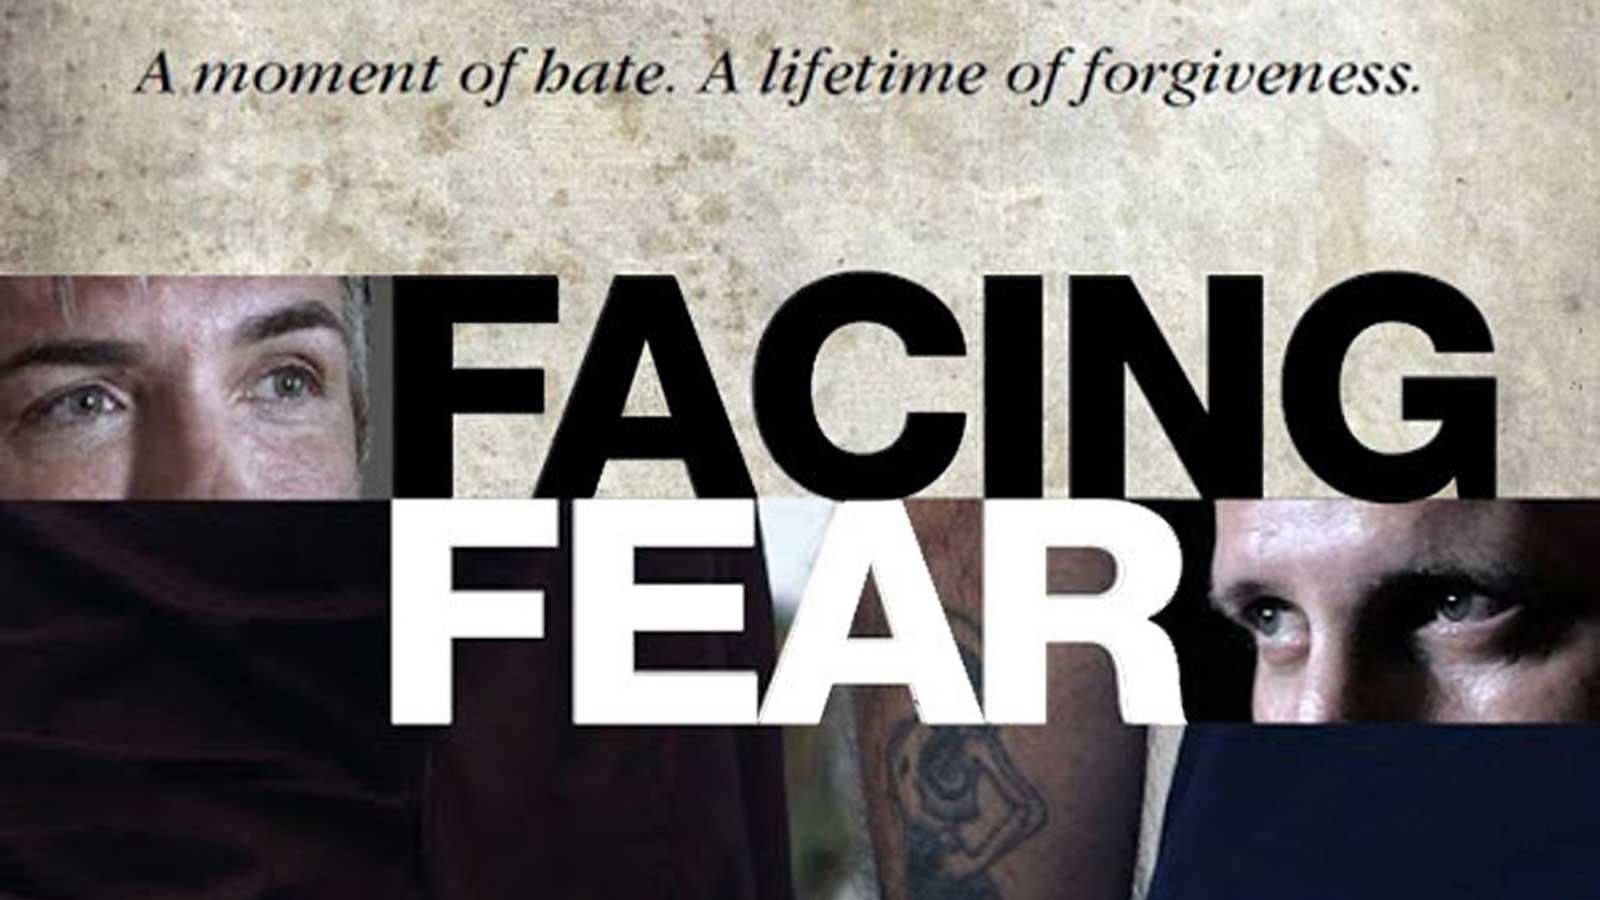 Facing Fear - image